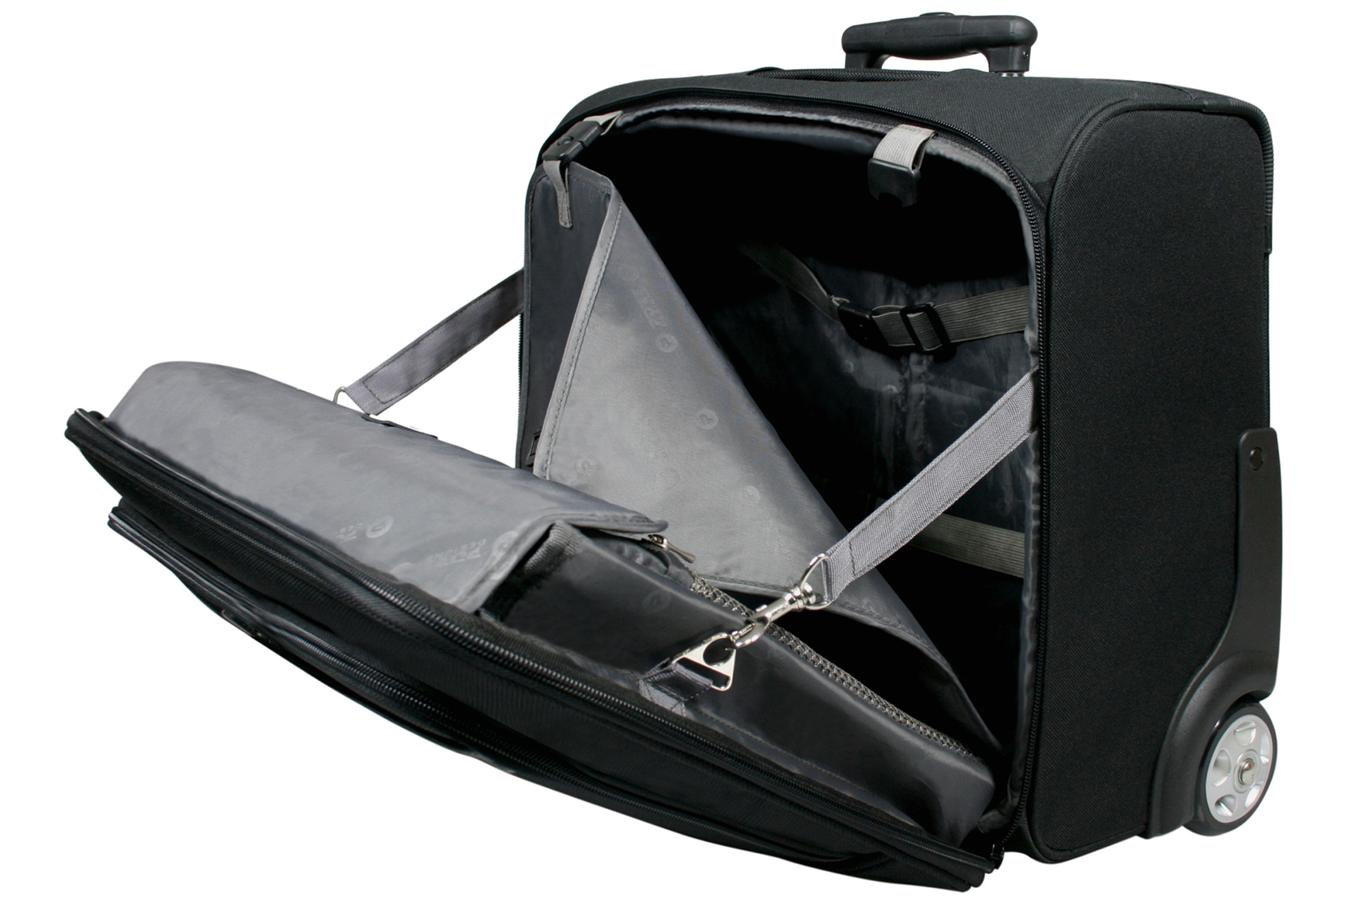 sacoche pour ordinateur portable port sacoche trolley manhattan 15 6 4161300 darty. Black Bedroom Furniture Sets. Home Design Ideas